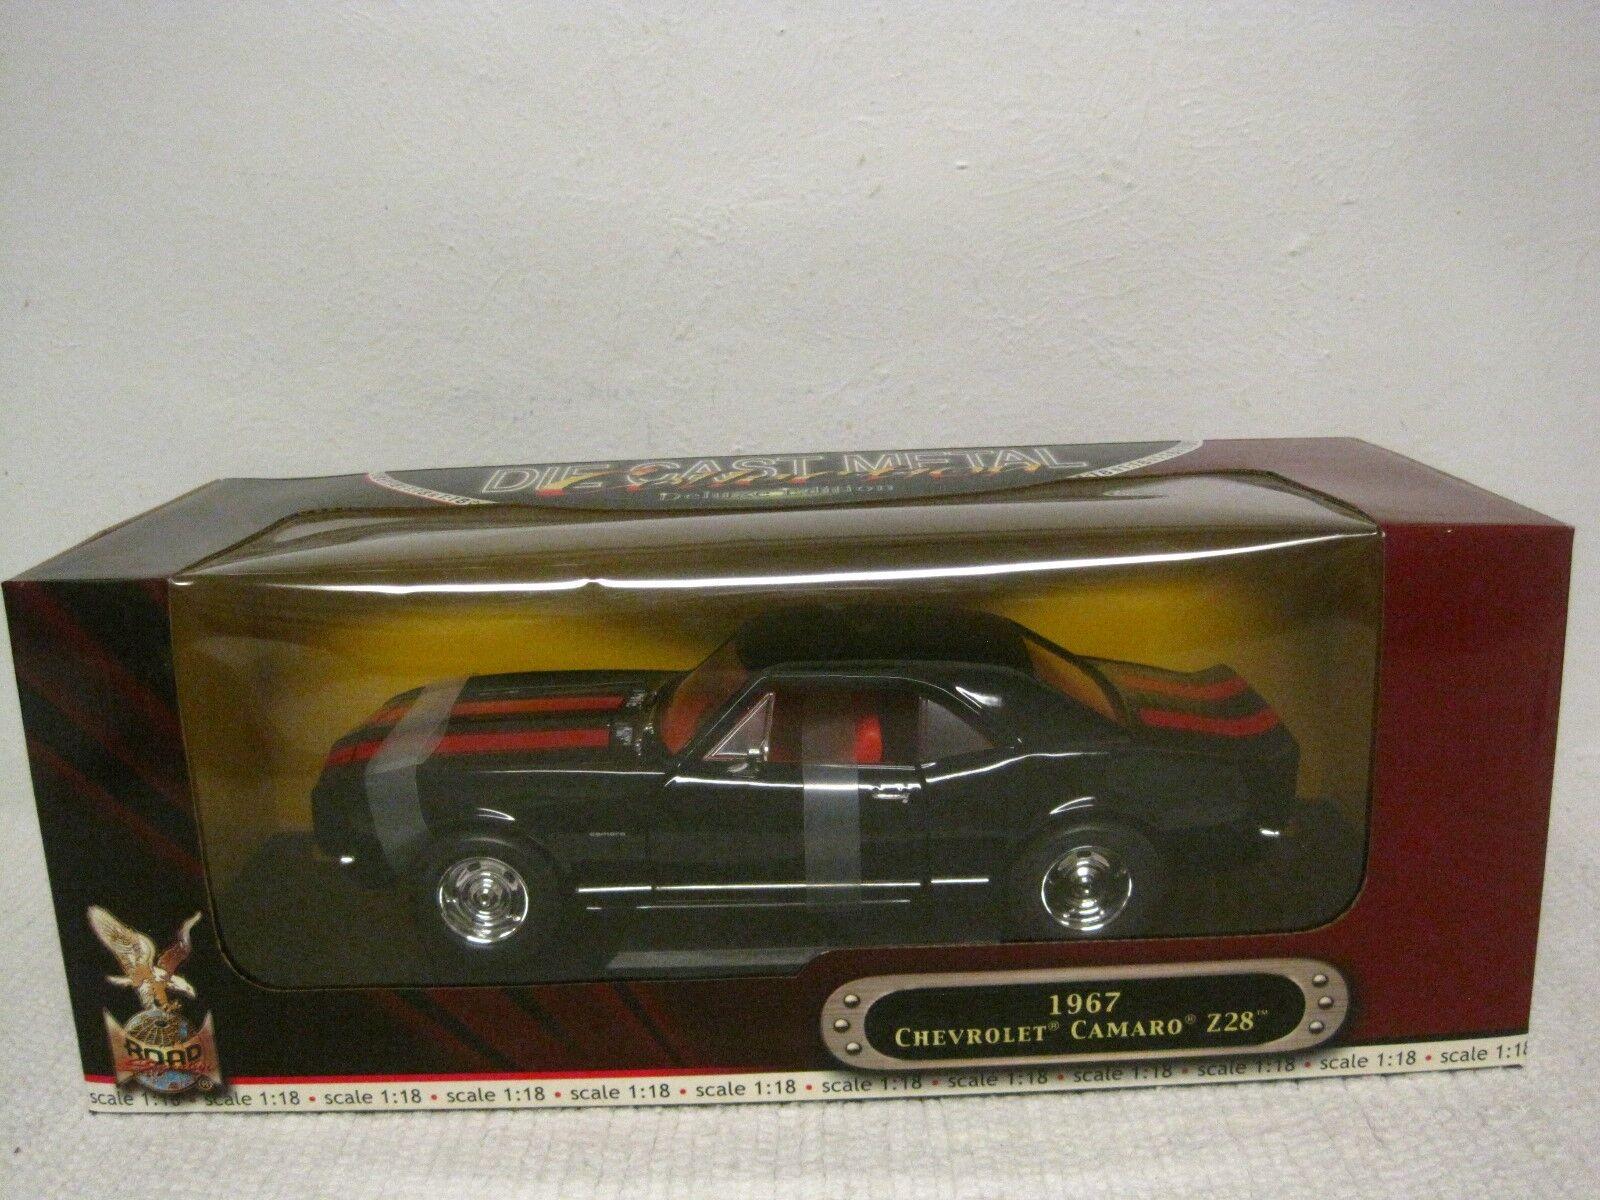 Road Signature Deluxe Edition 1967 Chevrolet Camaro Z28 DIE-CAST 1 18 nero rosso